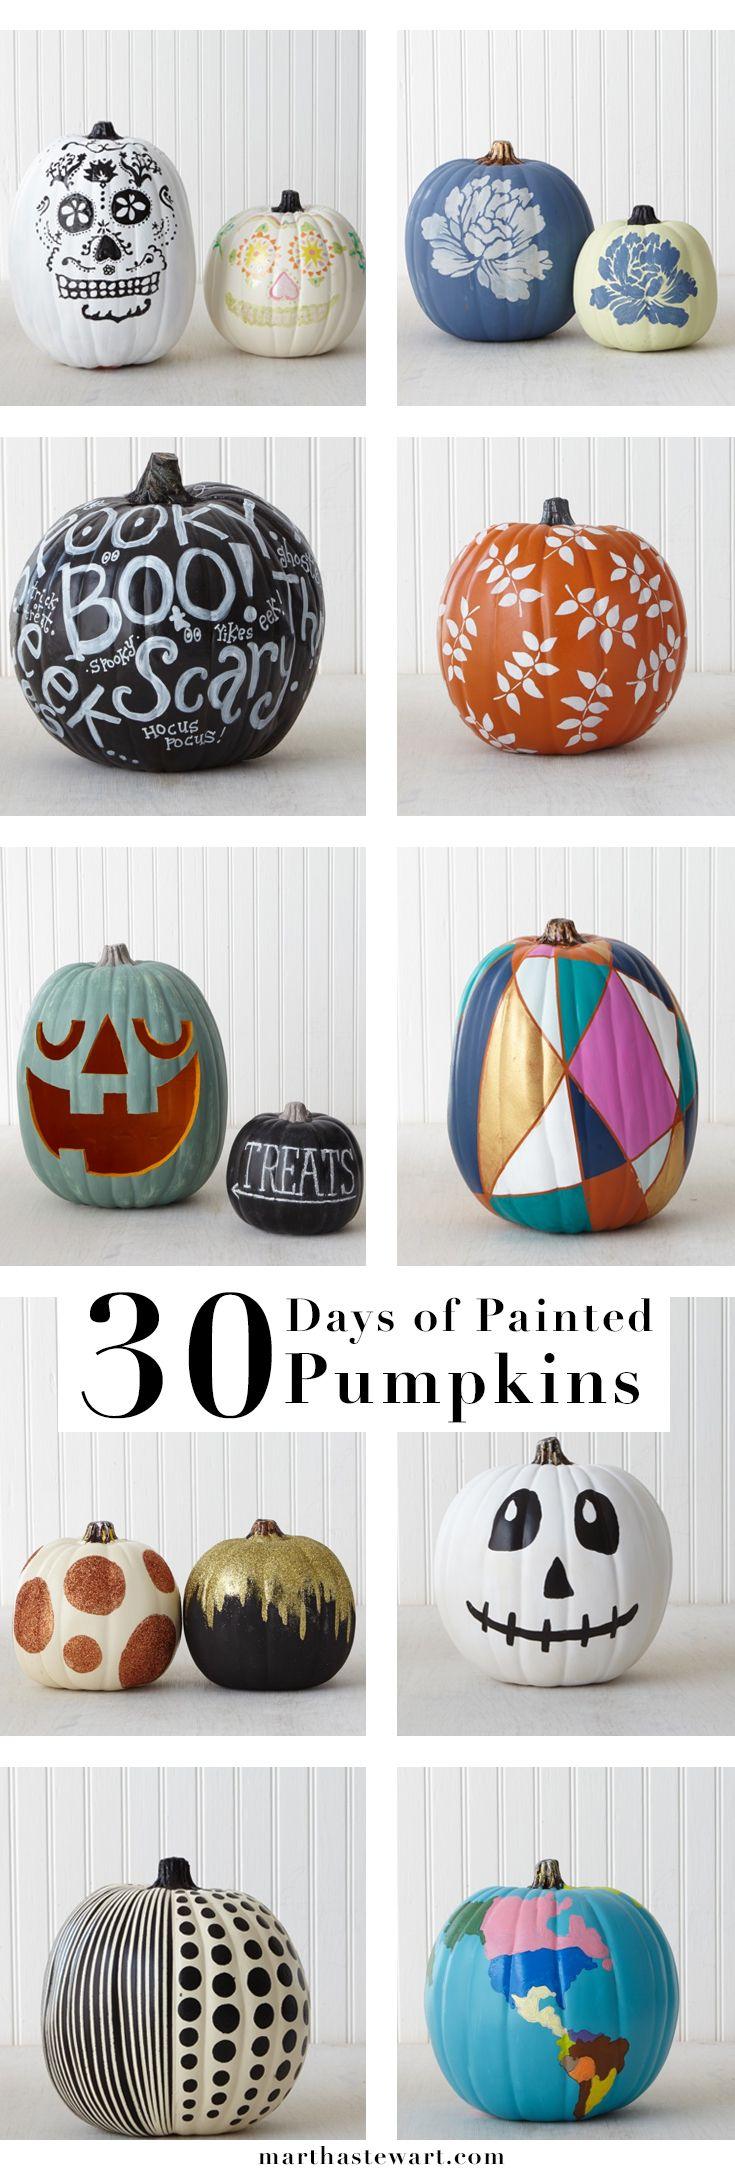 Get inspired by handmade pumpkin designs by Martha Stewart crafters and staffers using Martha Stewart Craft paints!